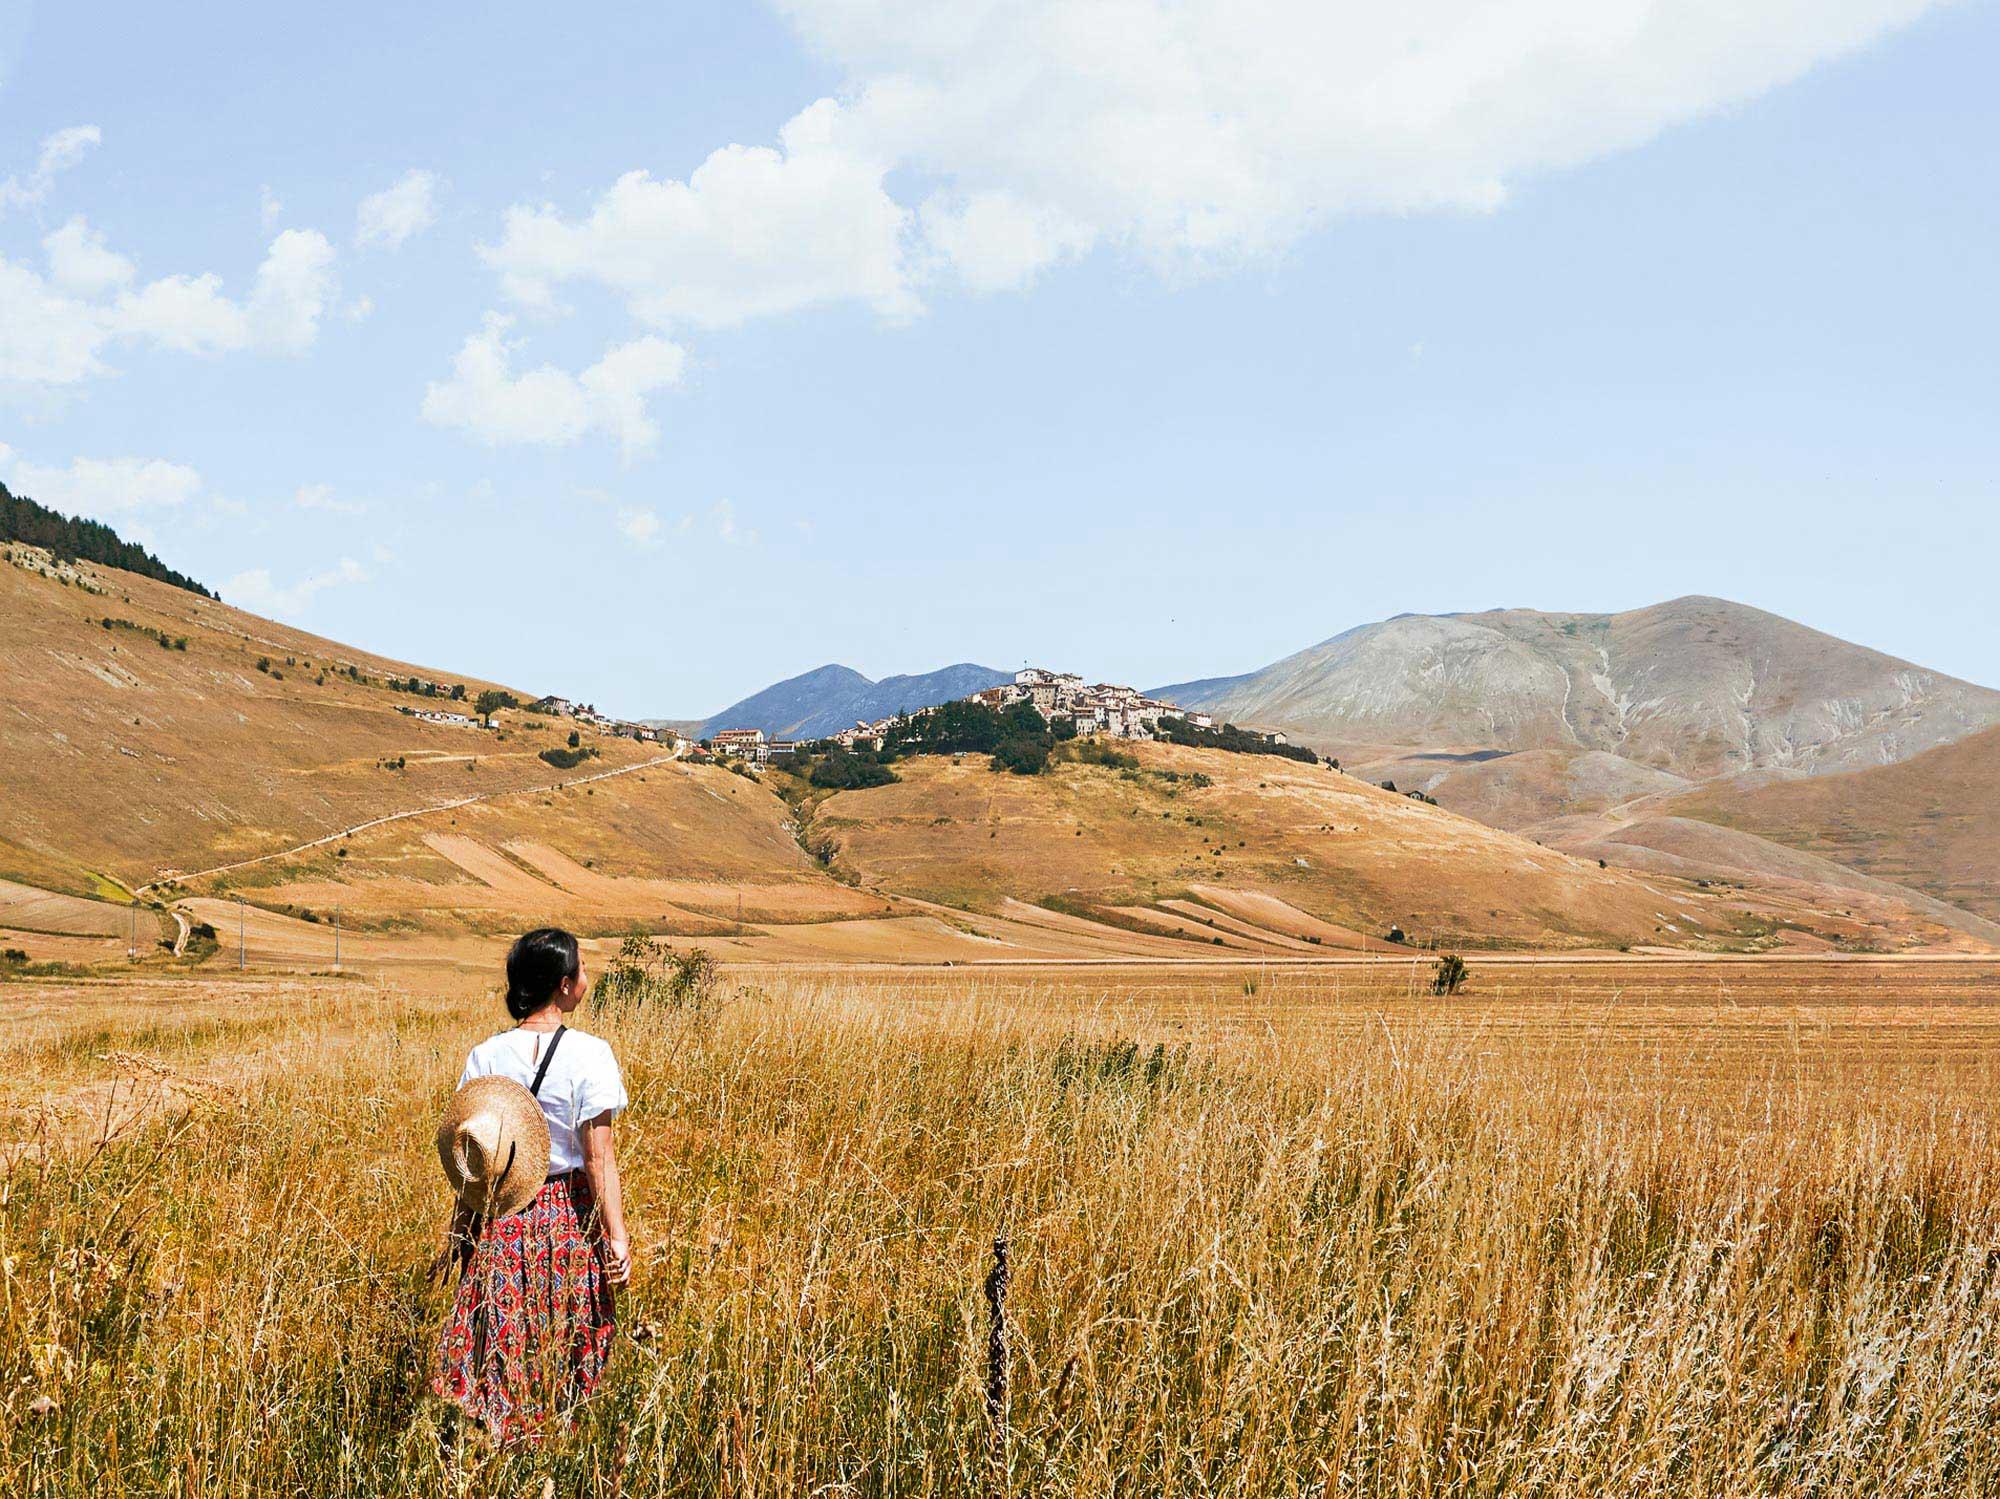 In Castelluccio, the Lentil Harvest Must Go On